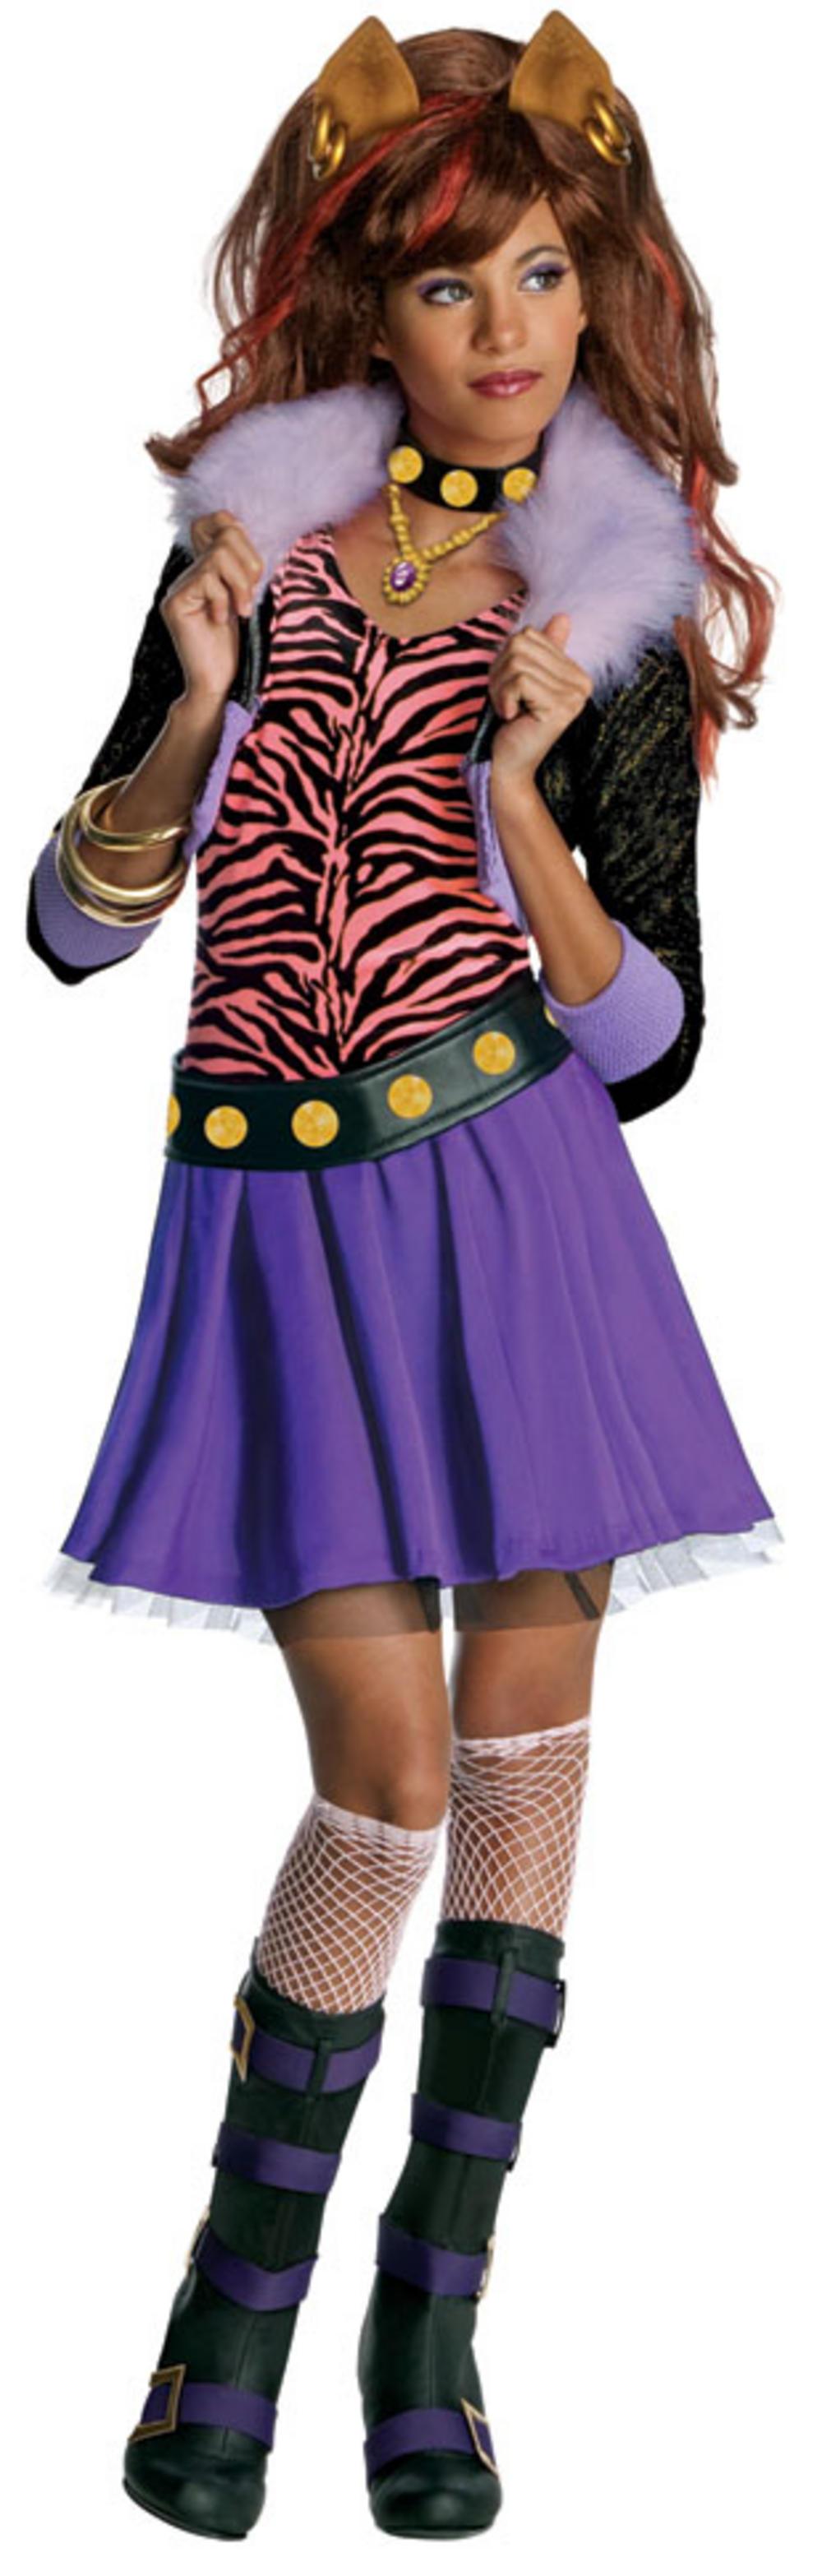 Girl's Clawdeen Wolf Monster High Costume